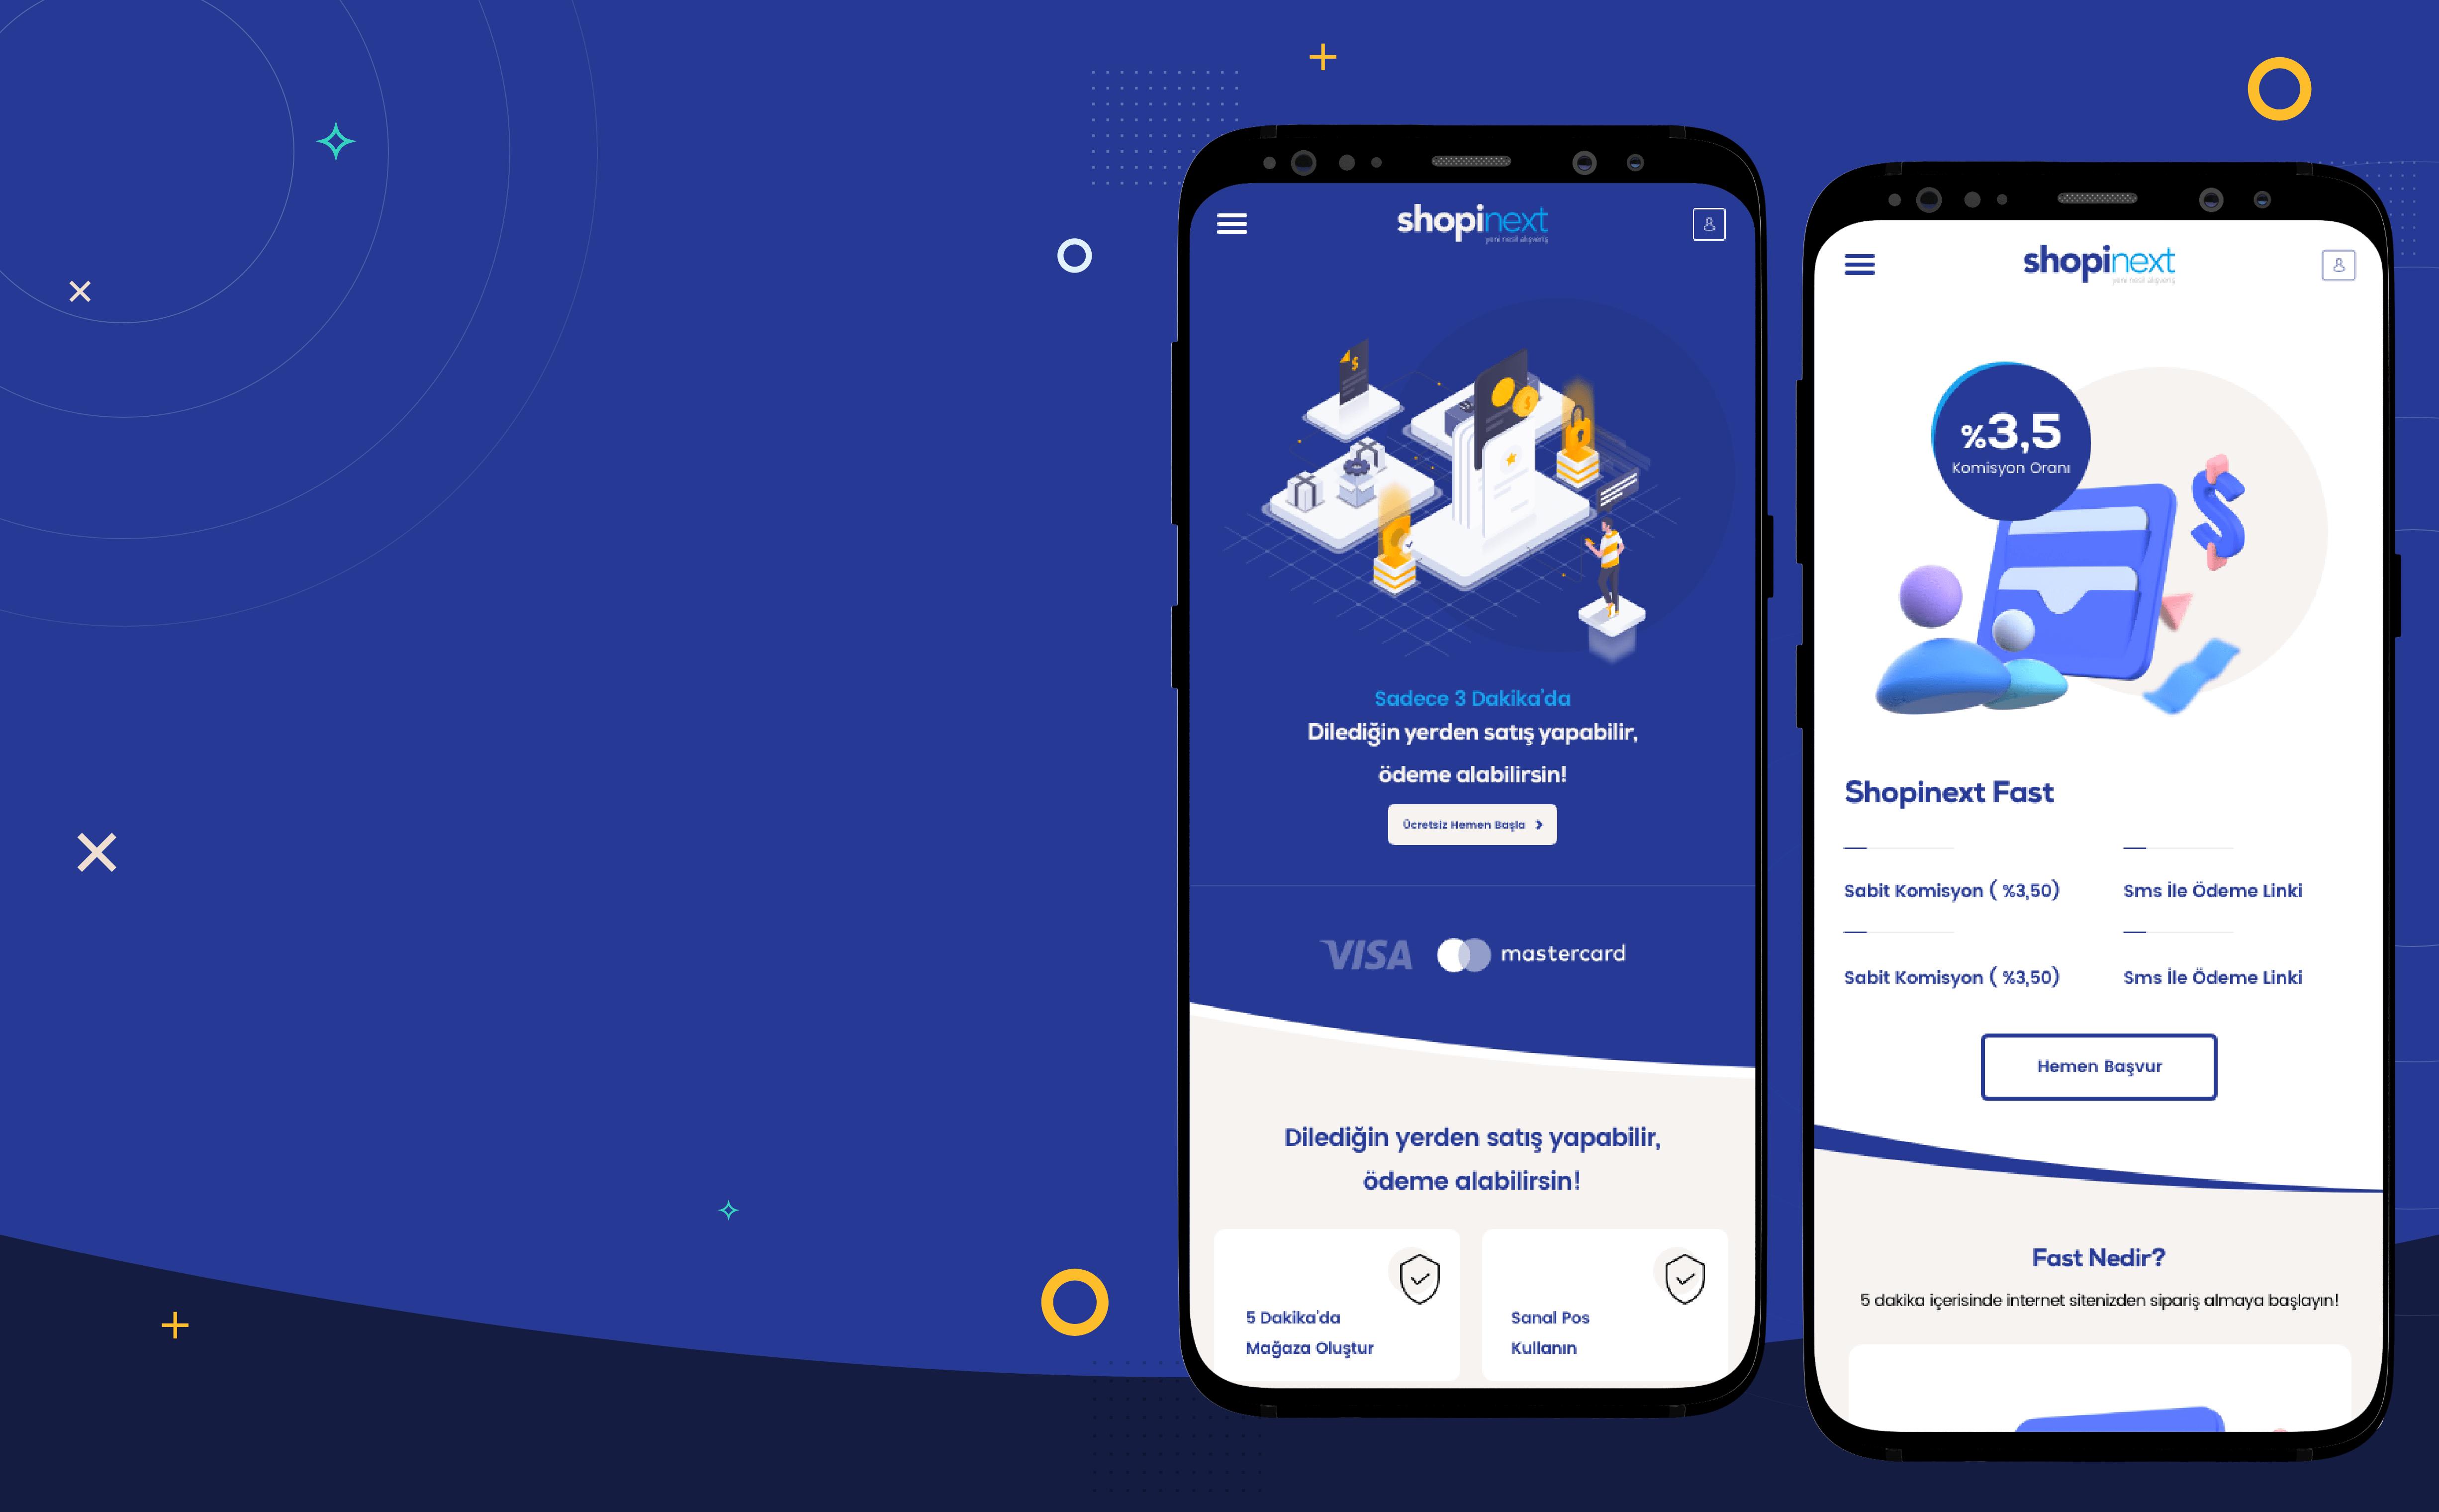 Shopinext Web Mobil Ui Ux Tasarım